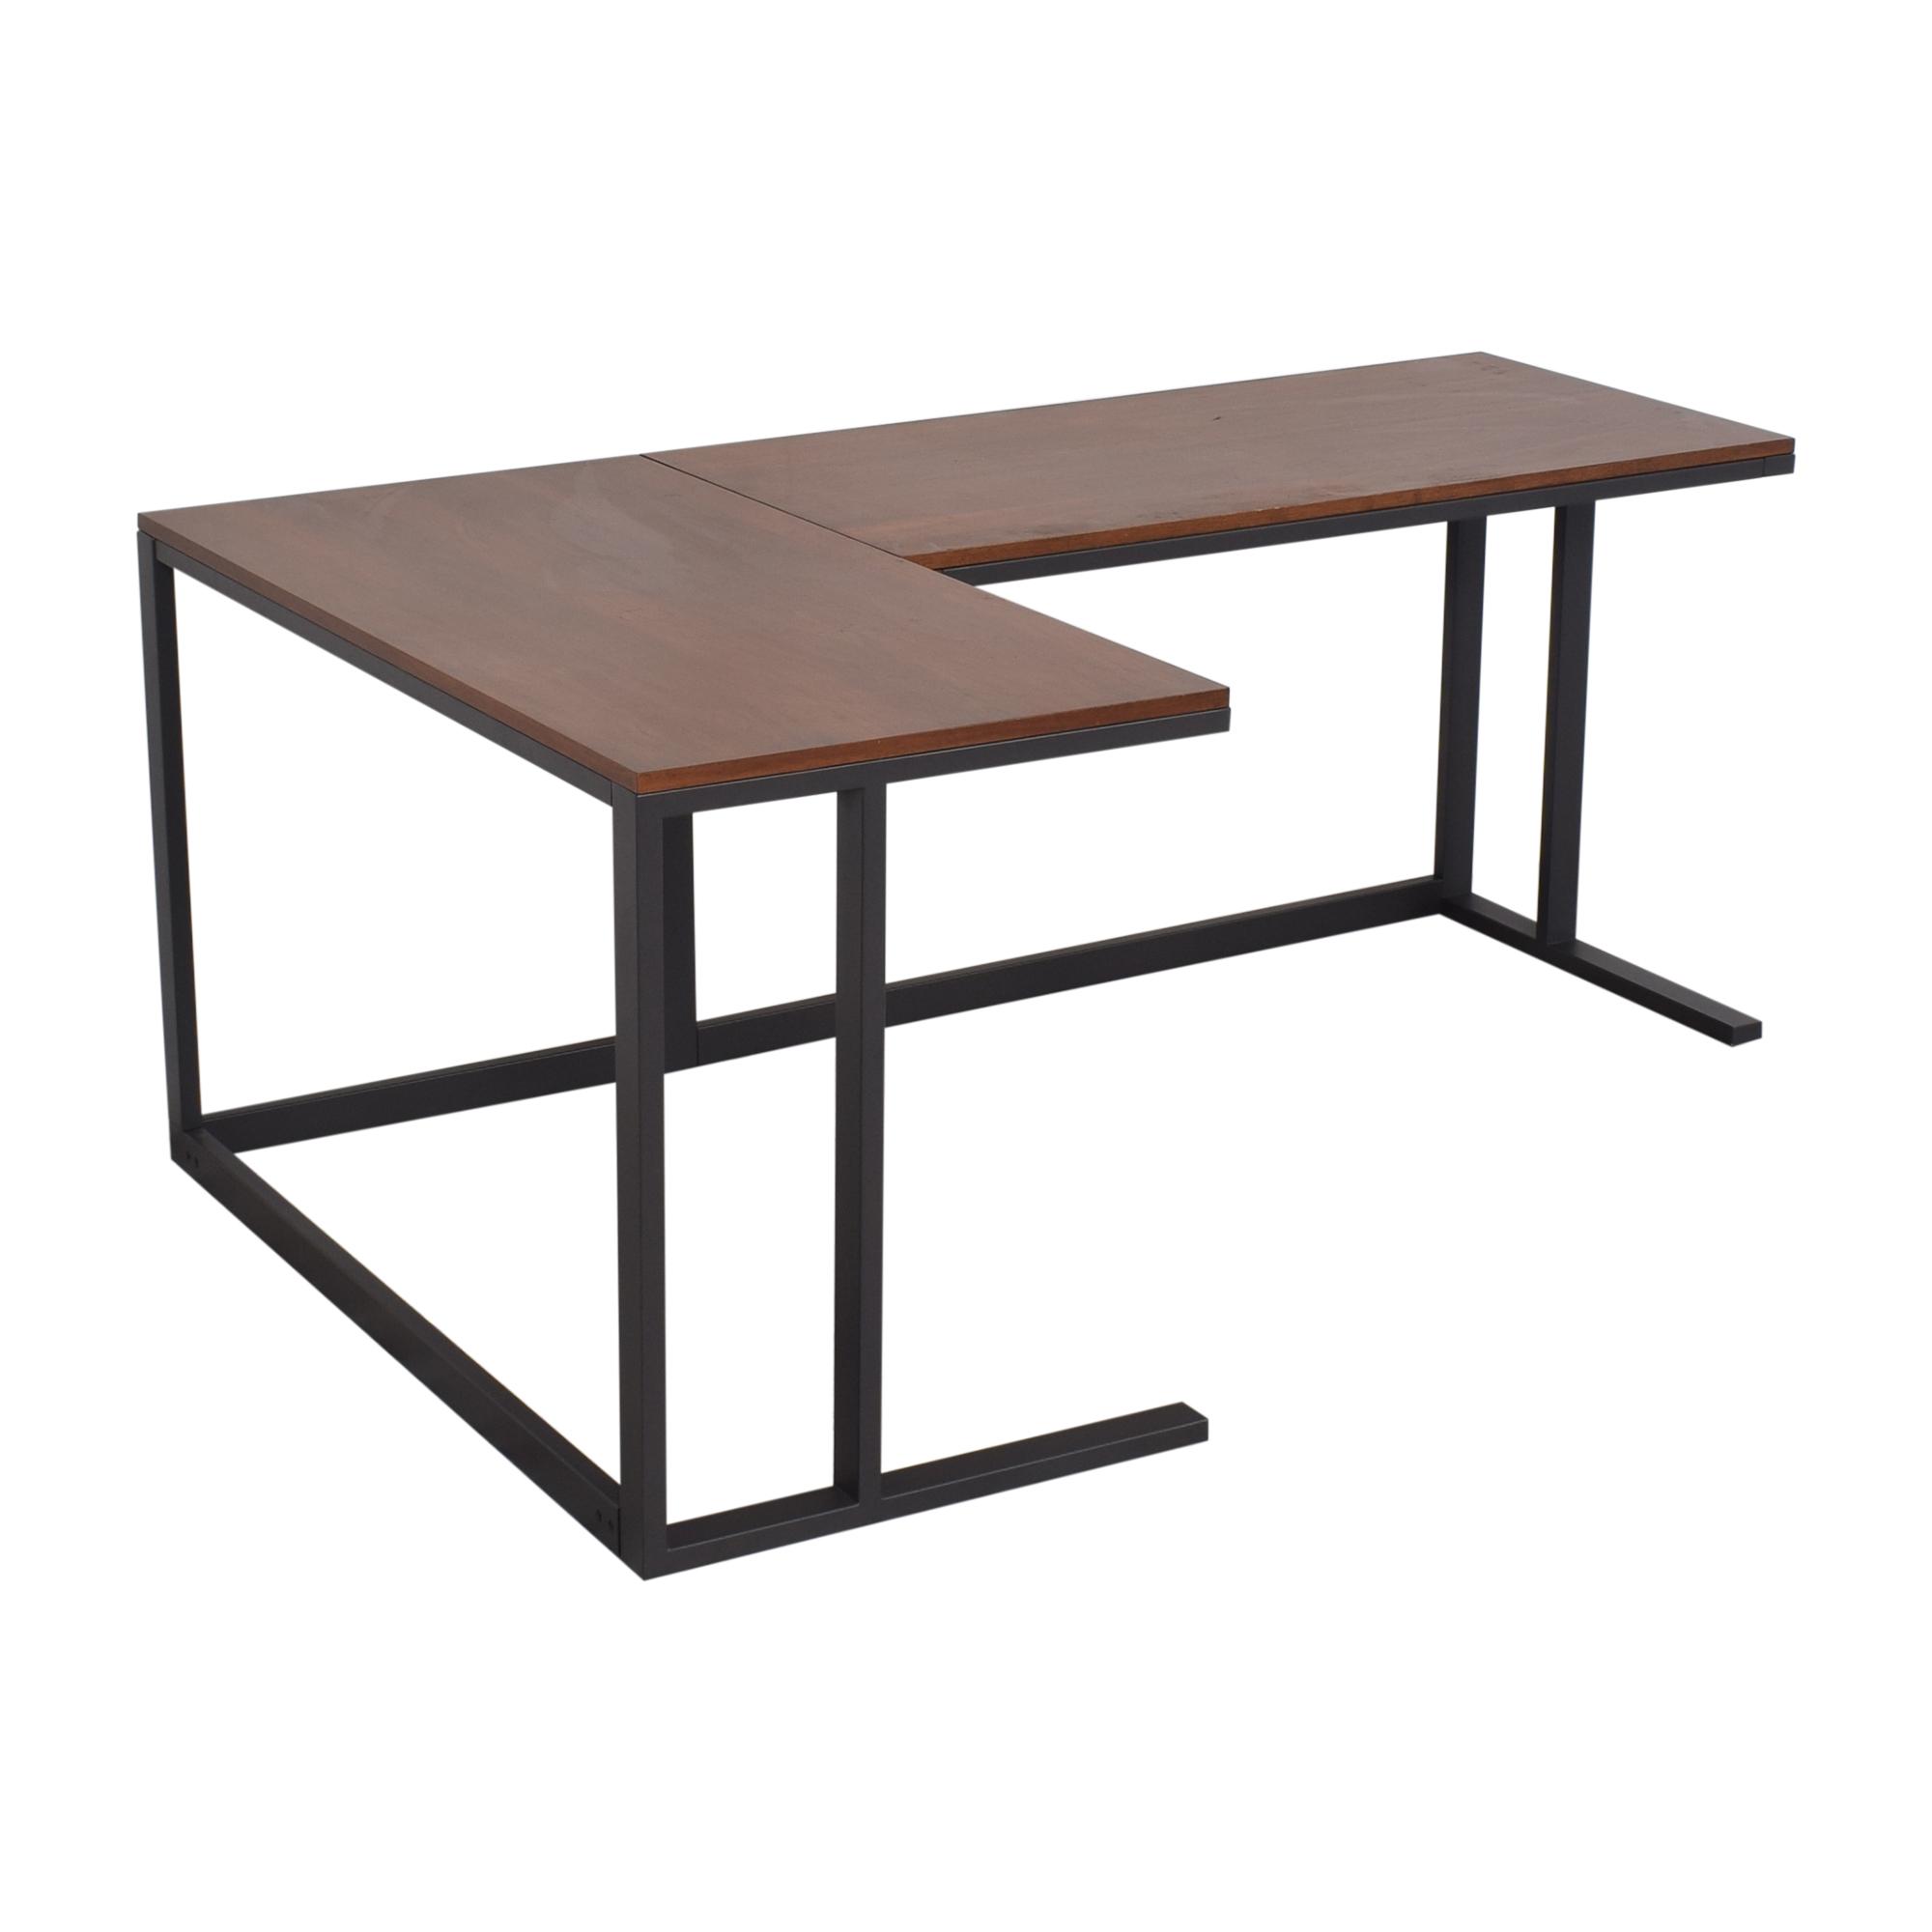 Crate & Barrel Crate & Barrel Pilsen Corner Desk on sale